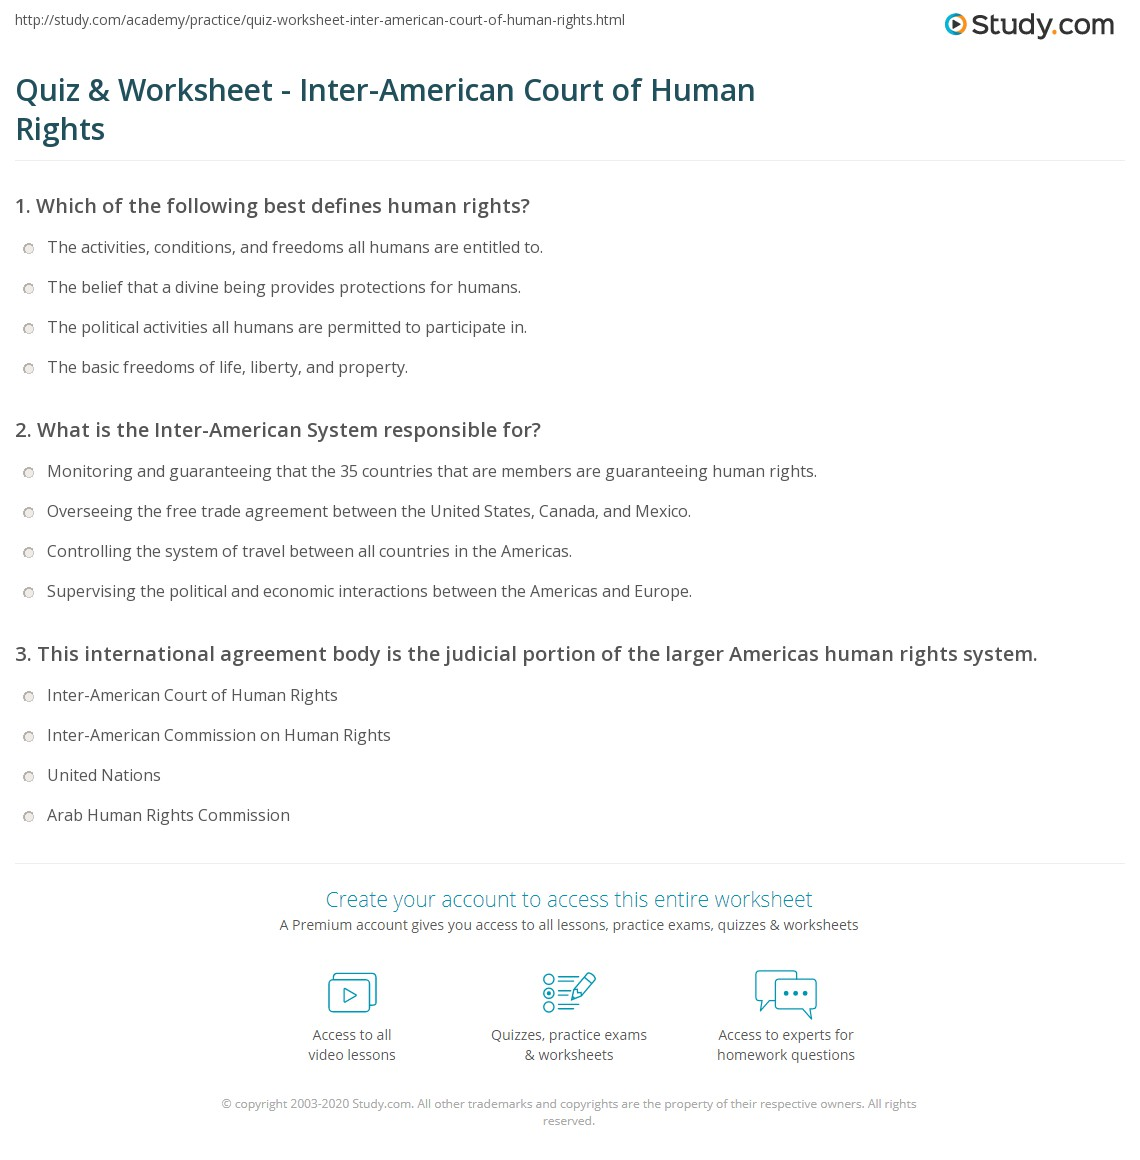 quiz worksheet inter american court of human rights. Black Bedroom Furniture Sets. Home Design Ideas